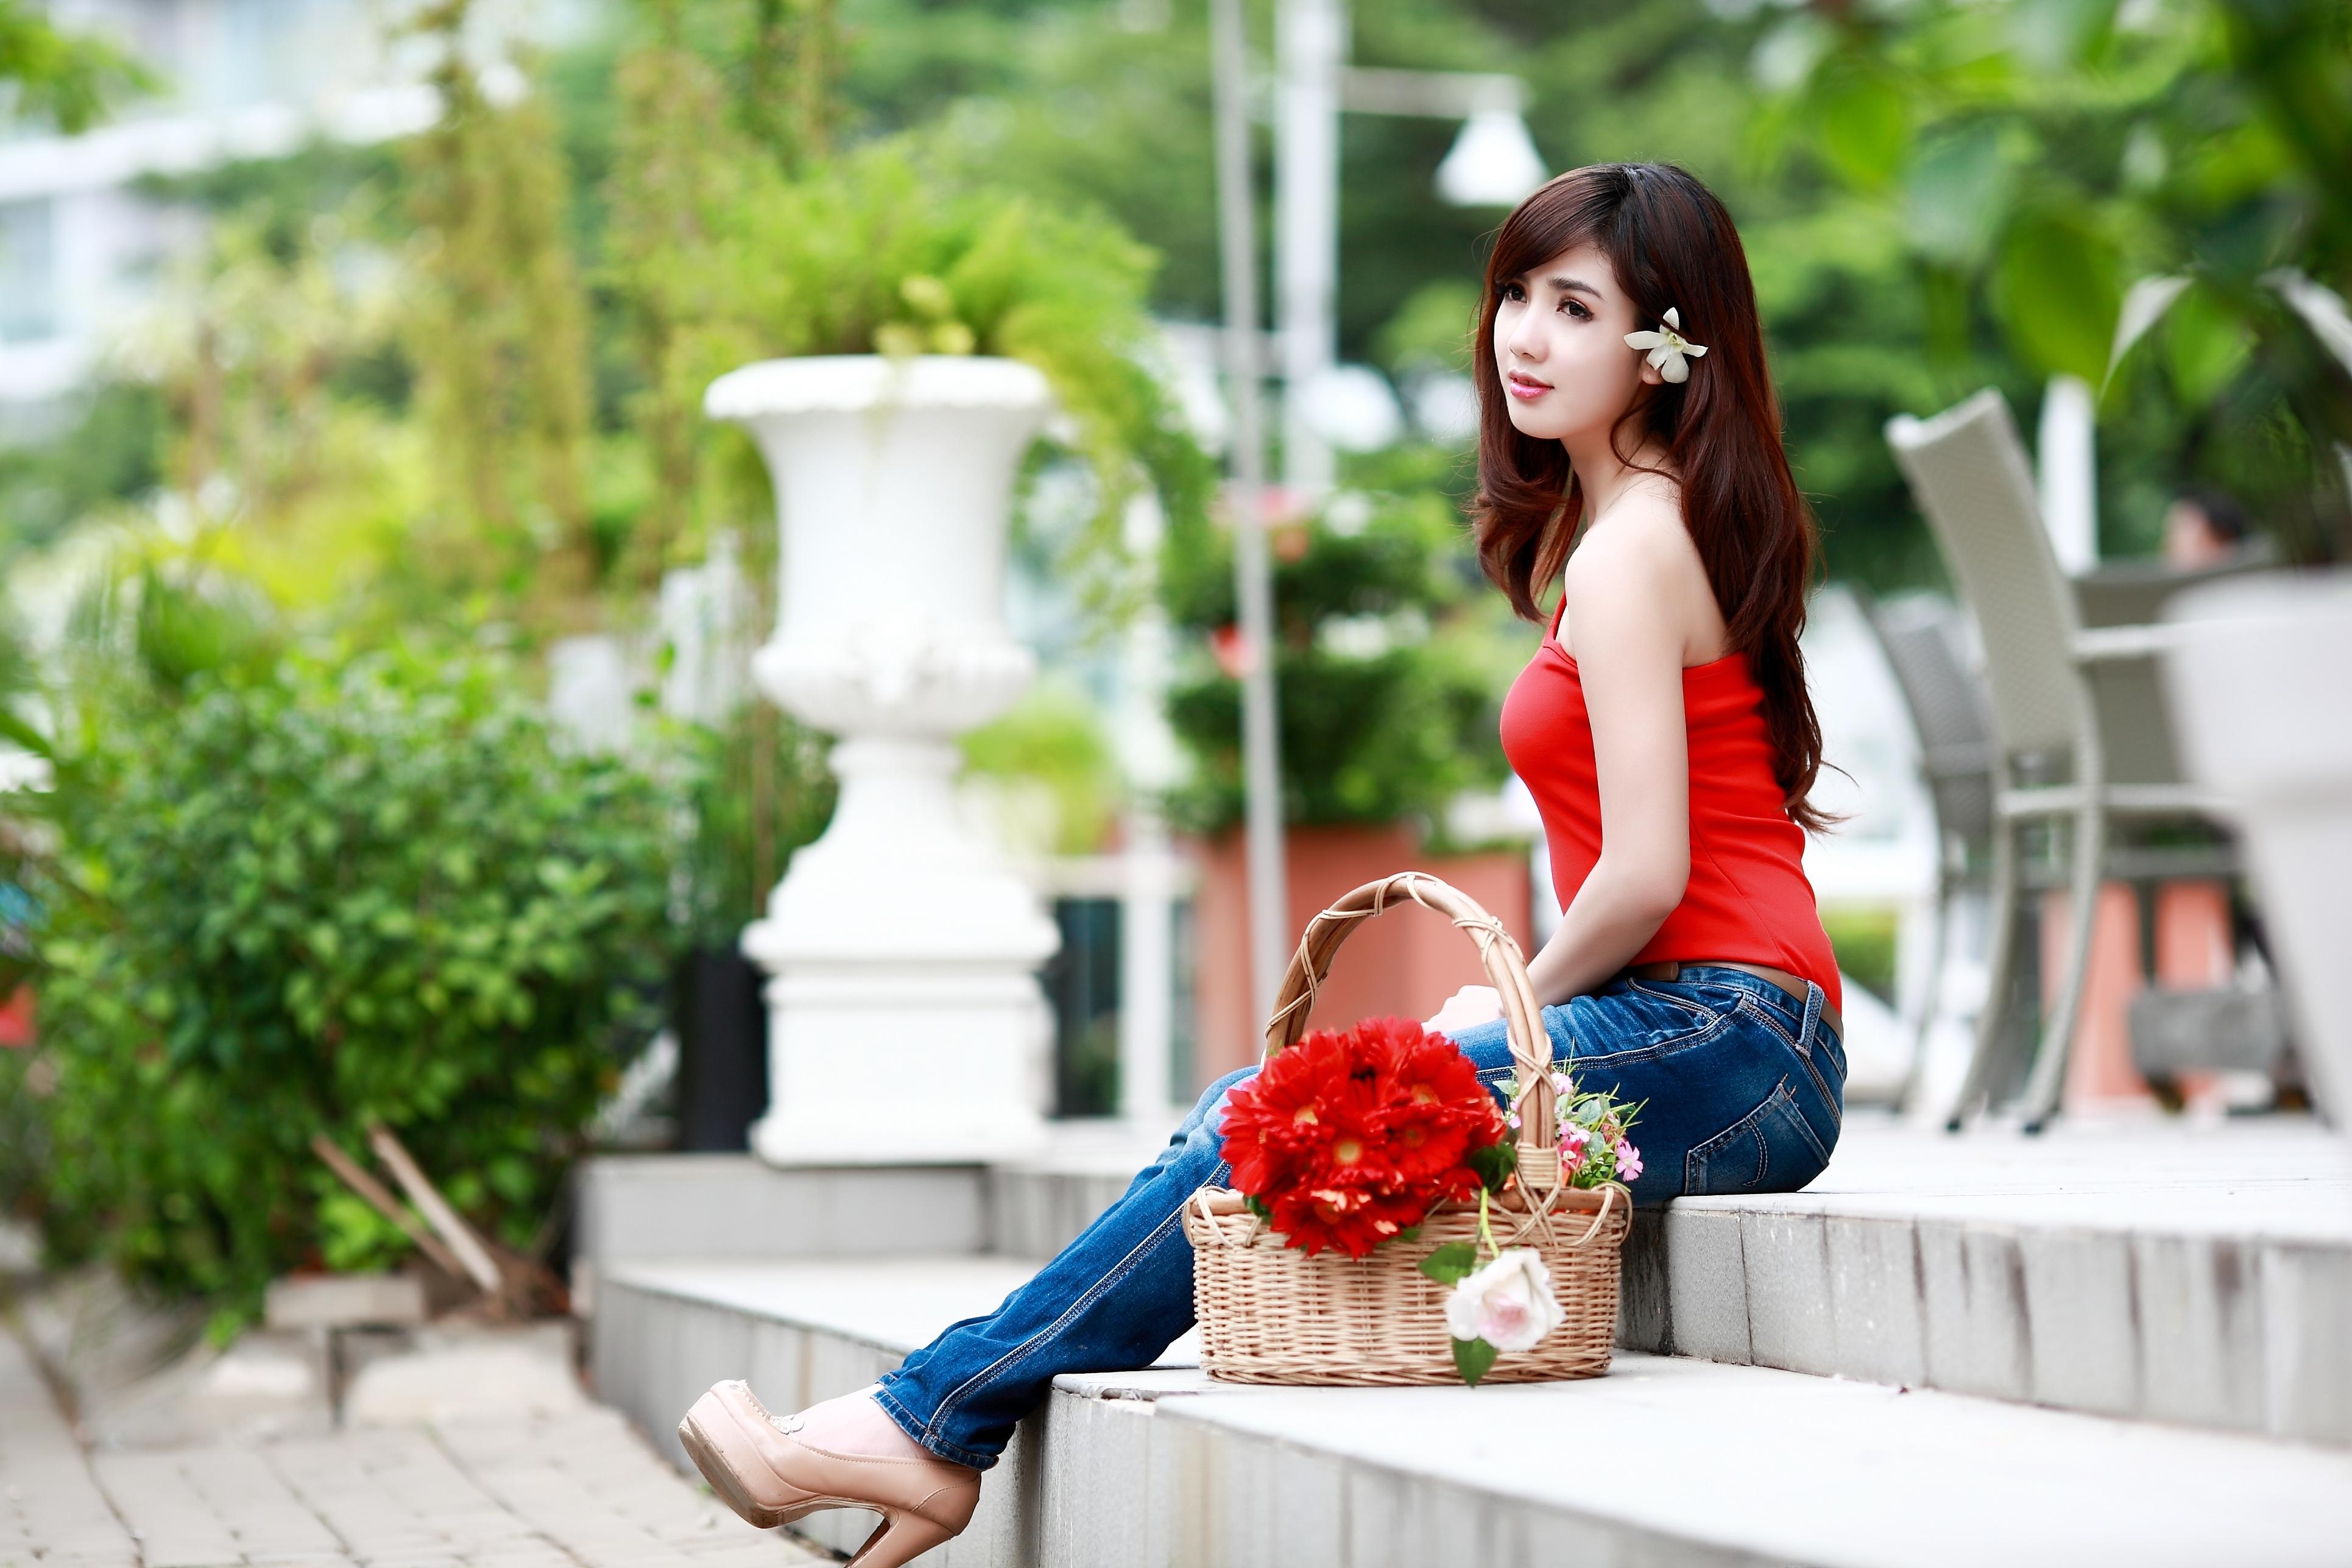 Beautiful Girl 4k Ultra Hd Wallpaper Full - HD Wallpaper